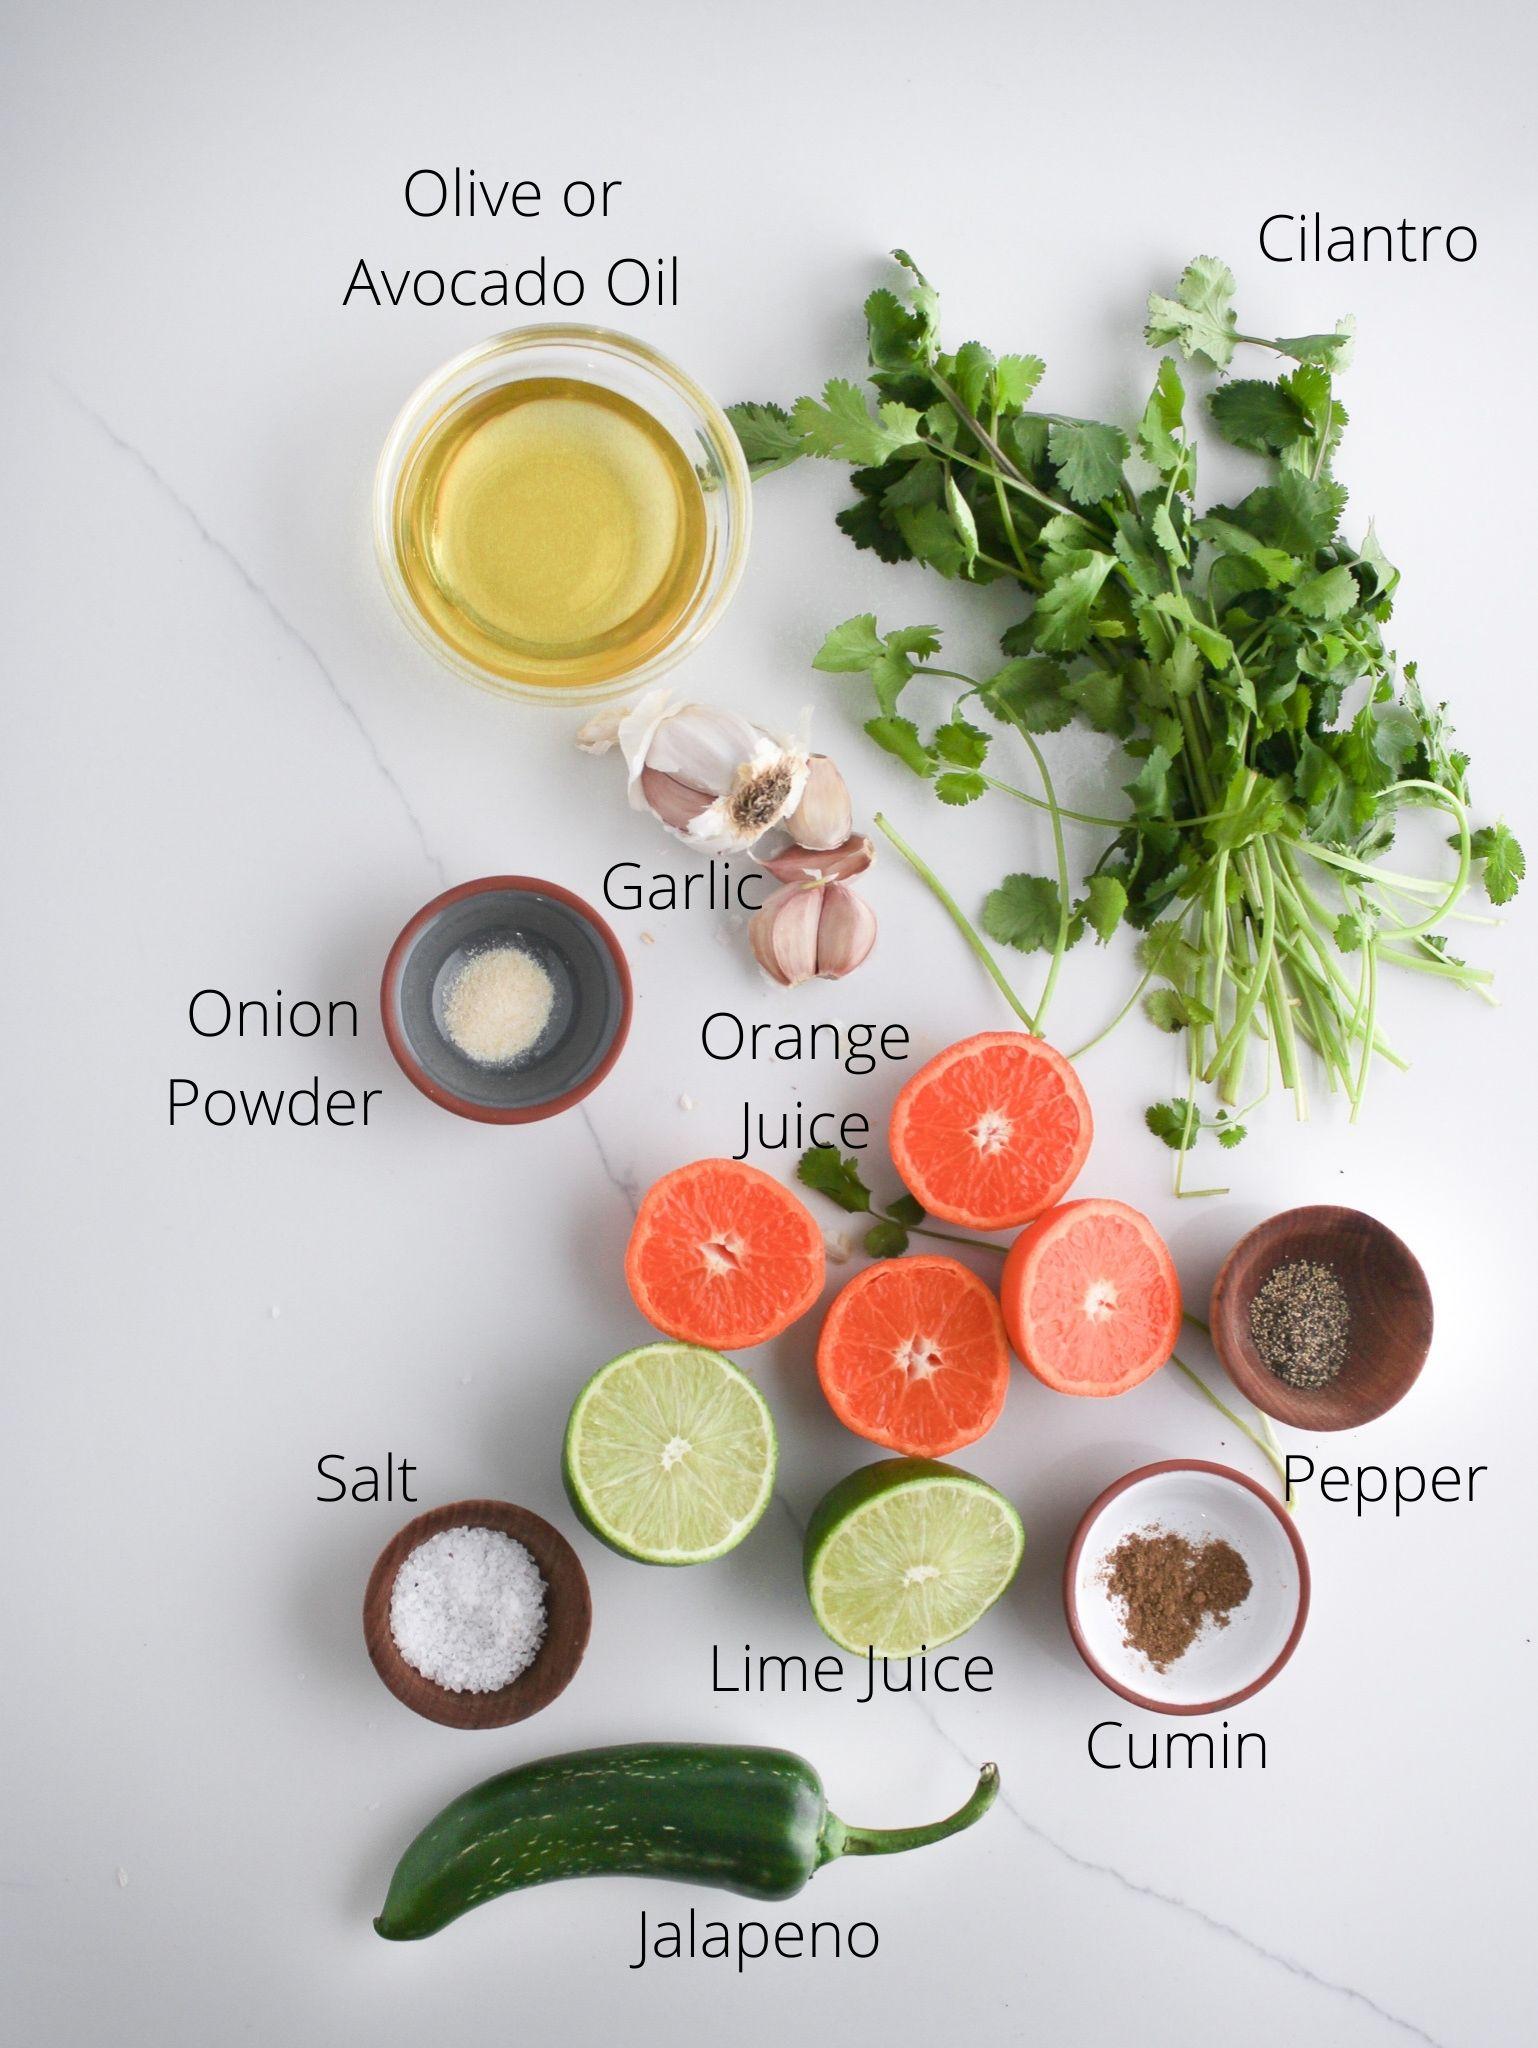 Carne asada ingredients laid out including olive or avocado oil, cilantro, garlic, lime juice, orange juice, jalapeno, onion powder, cumin, salt and pepper